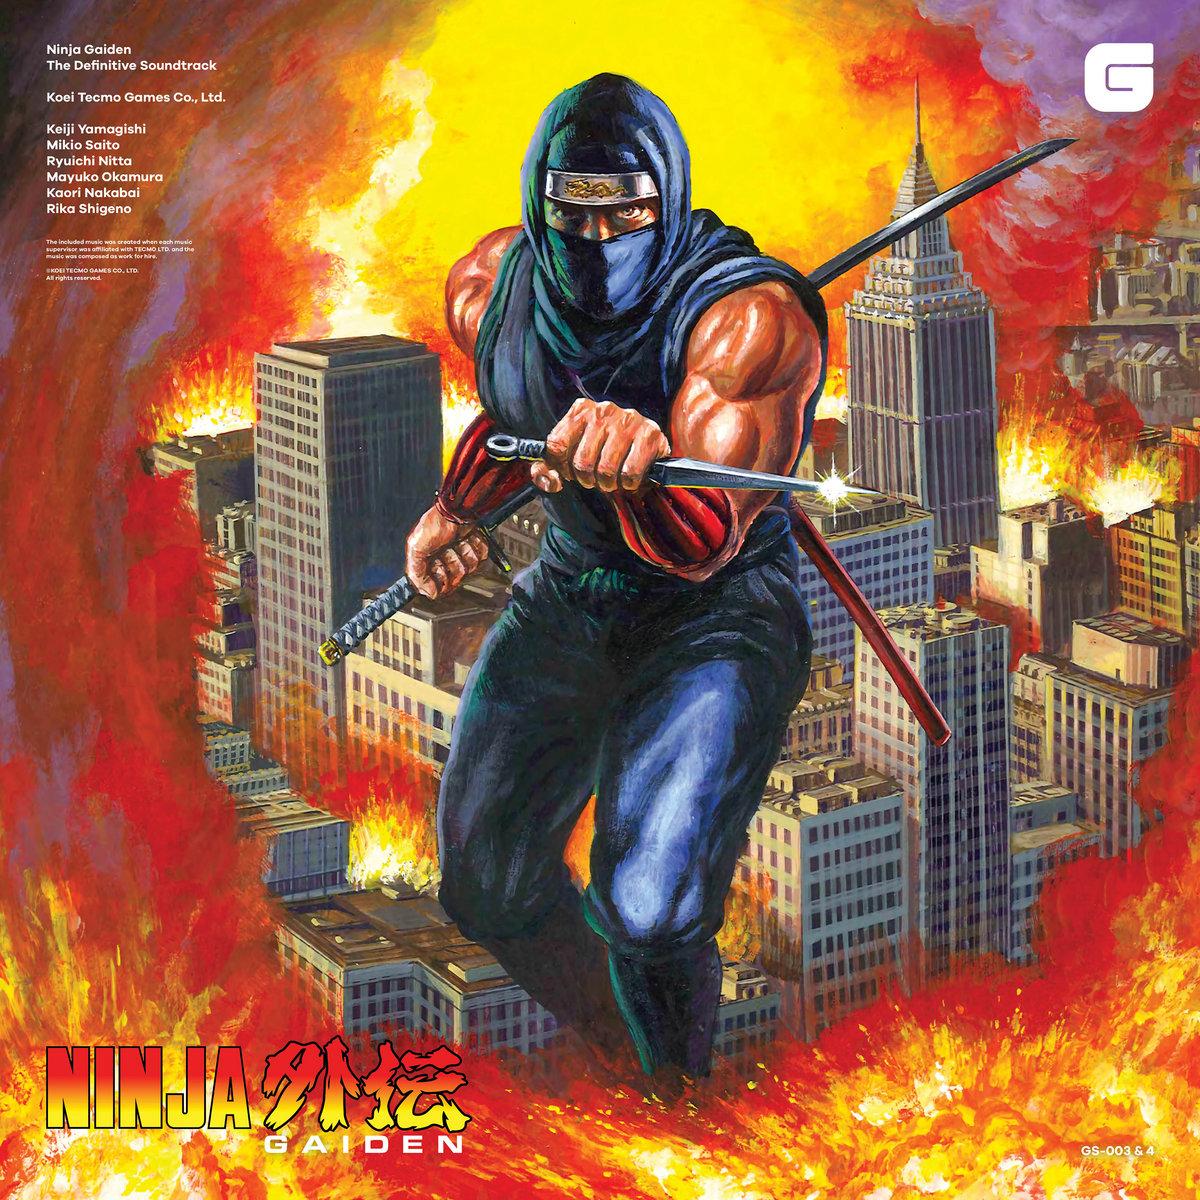 Ninja Gaiden The Definitive Soundtrack Vol. 1 + 2